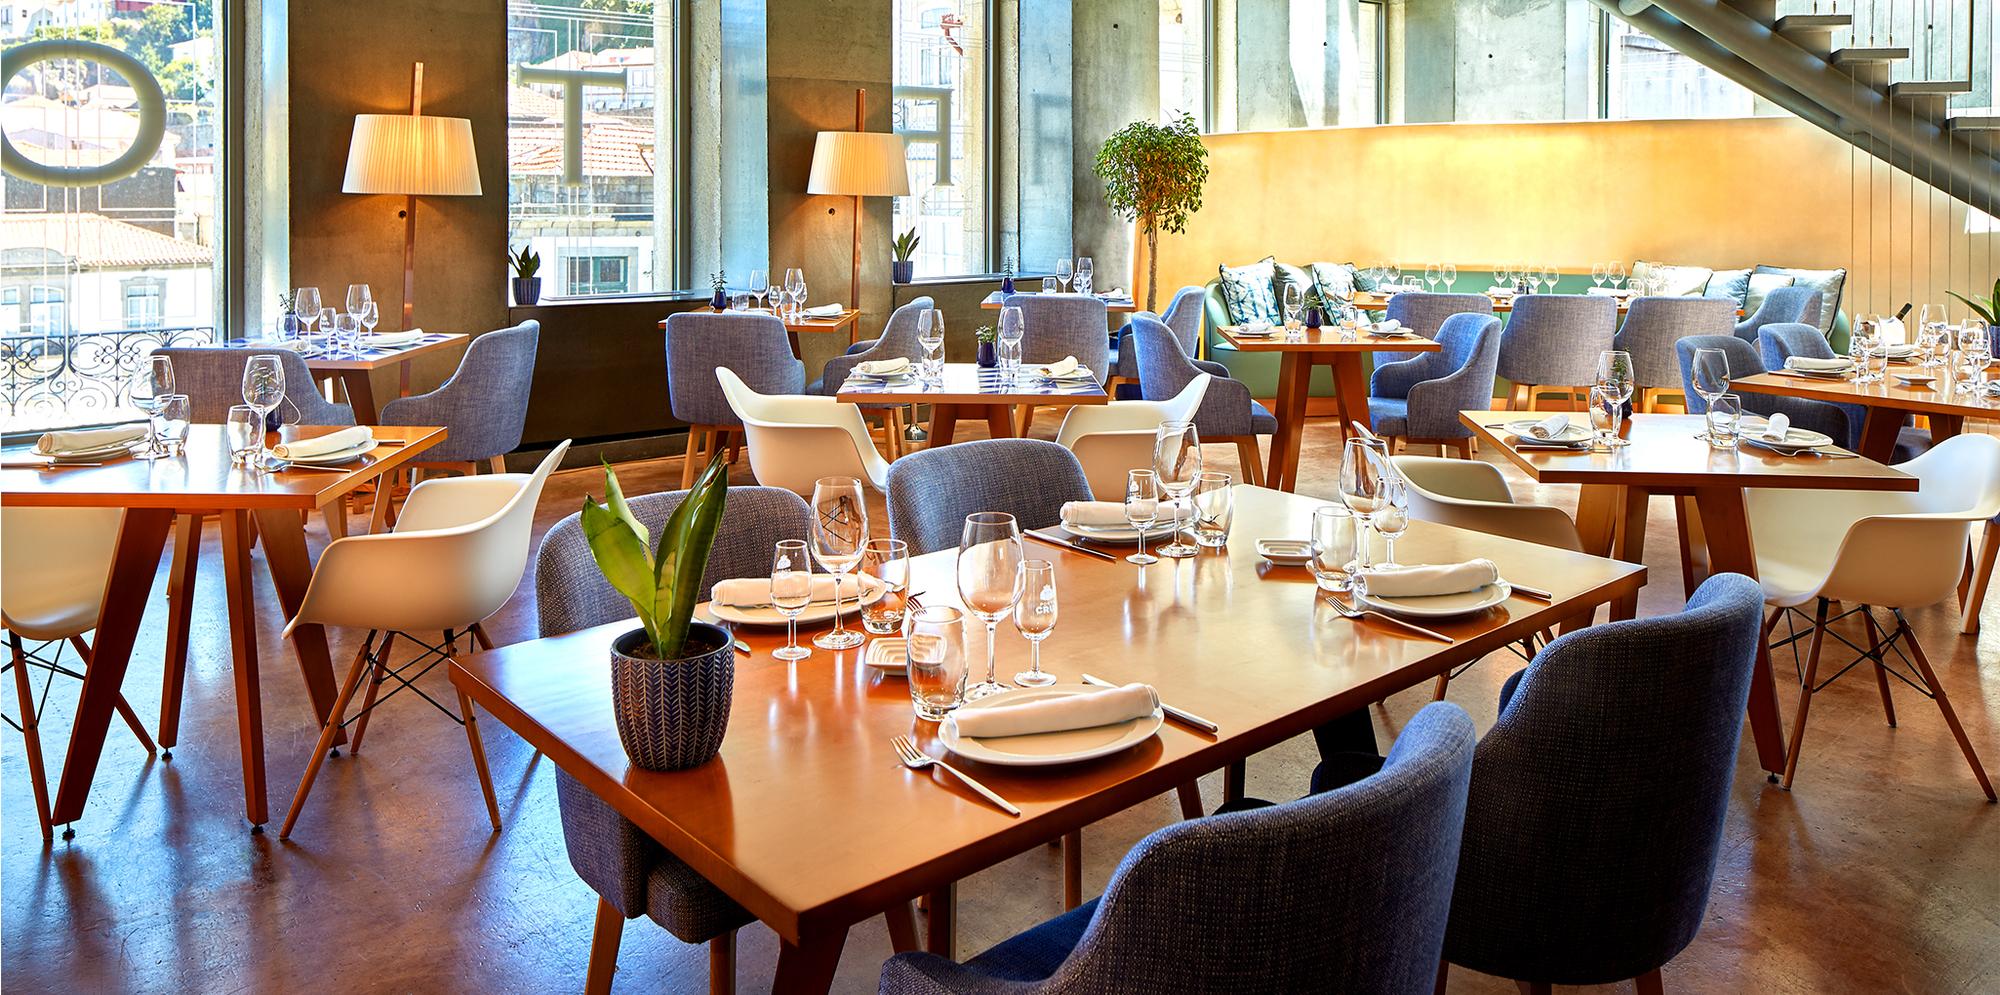 5 Outstanding Restaurants in Porto for Food Lovers